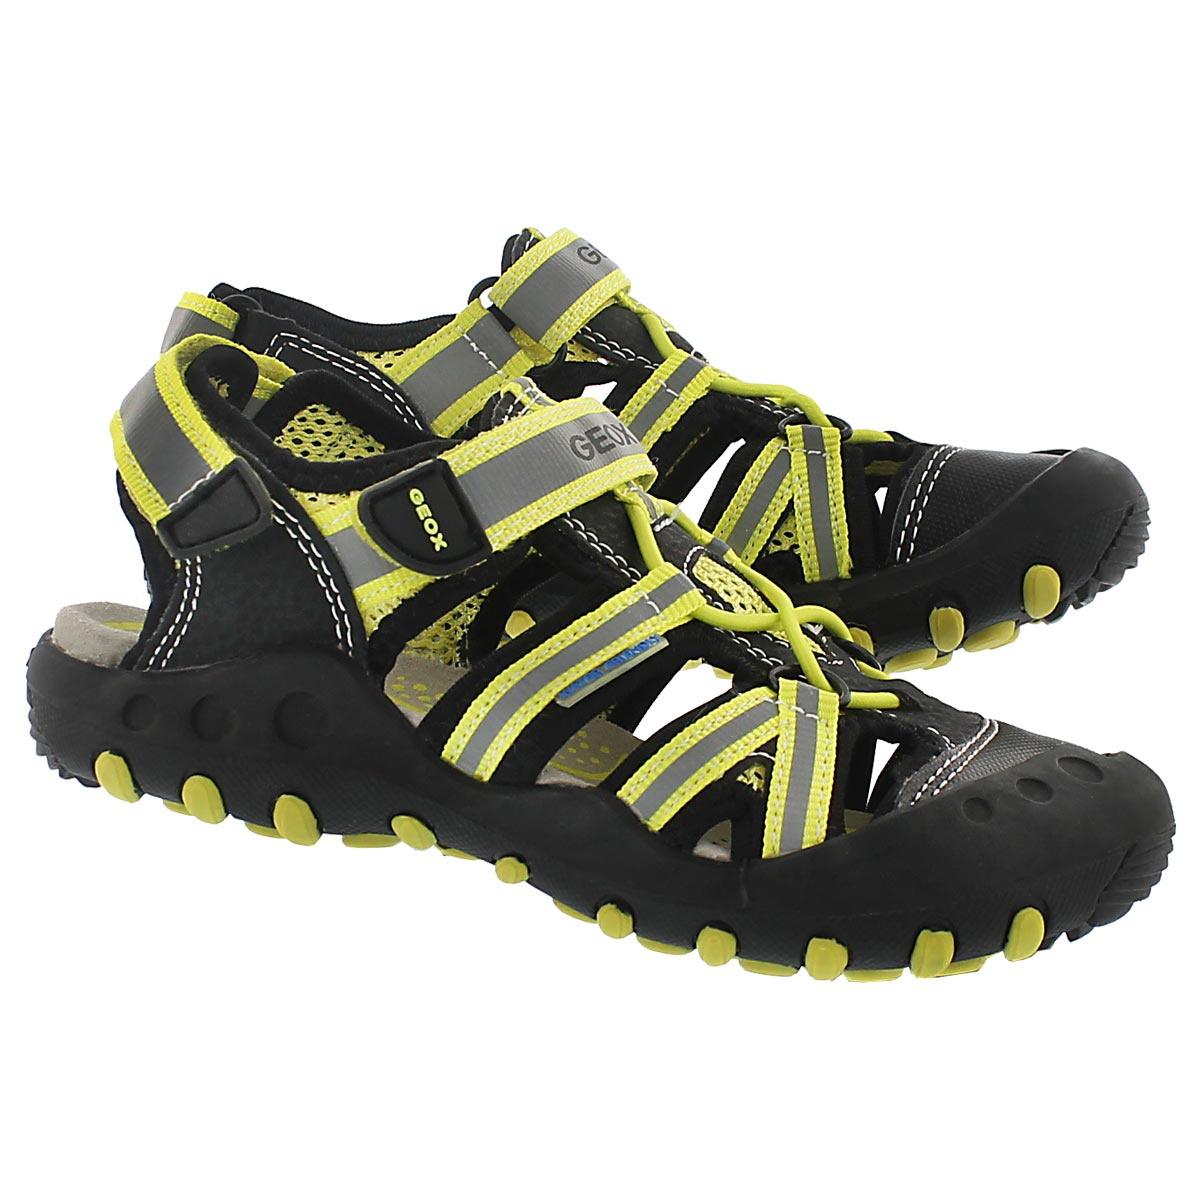 Sandale pêcheur KYLE, noir/lime, garçons